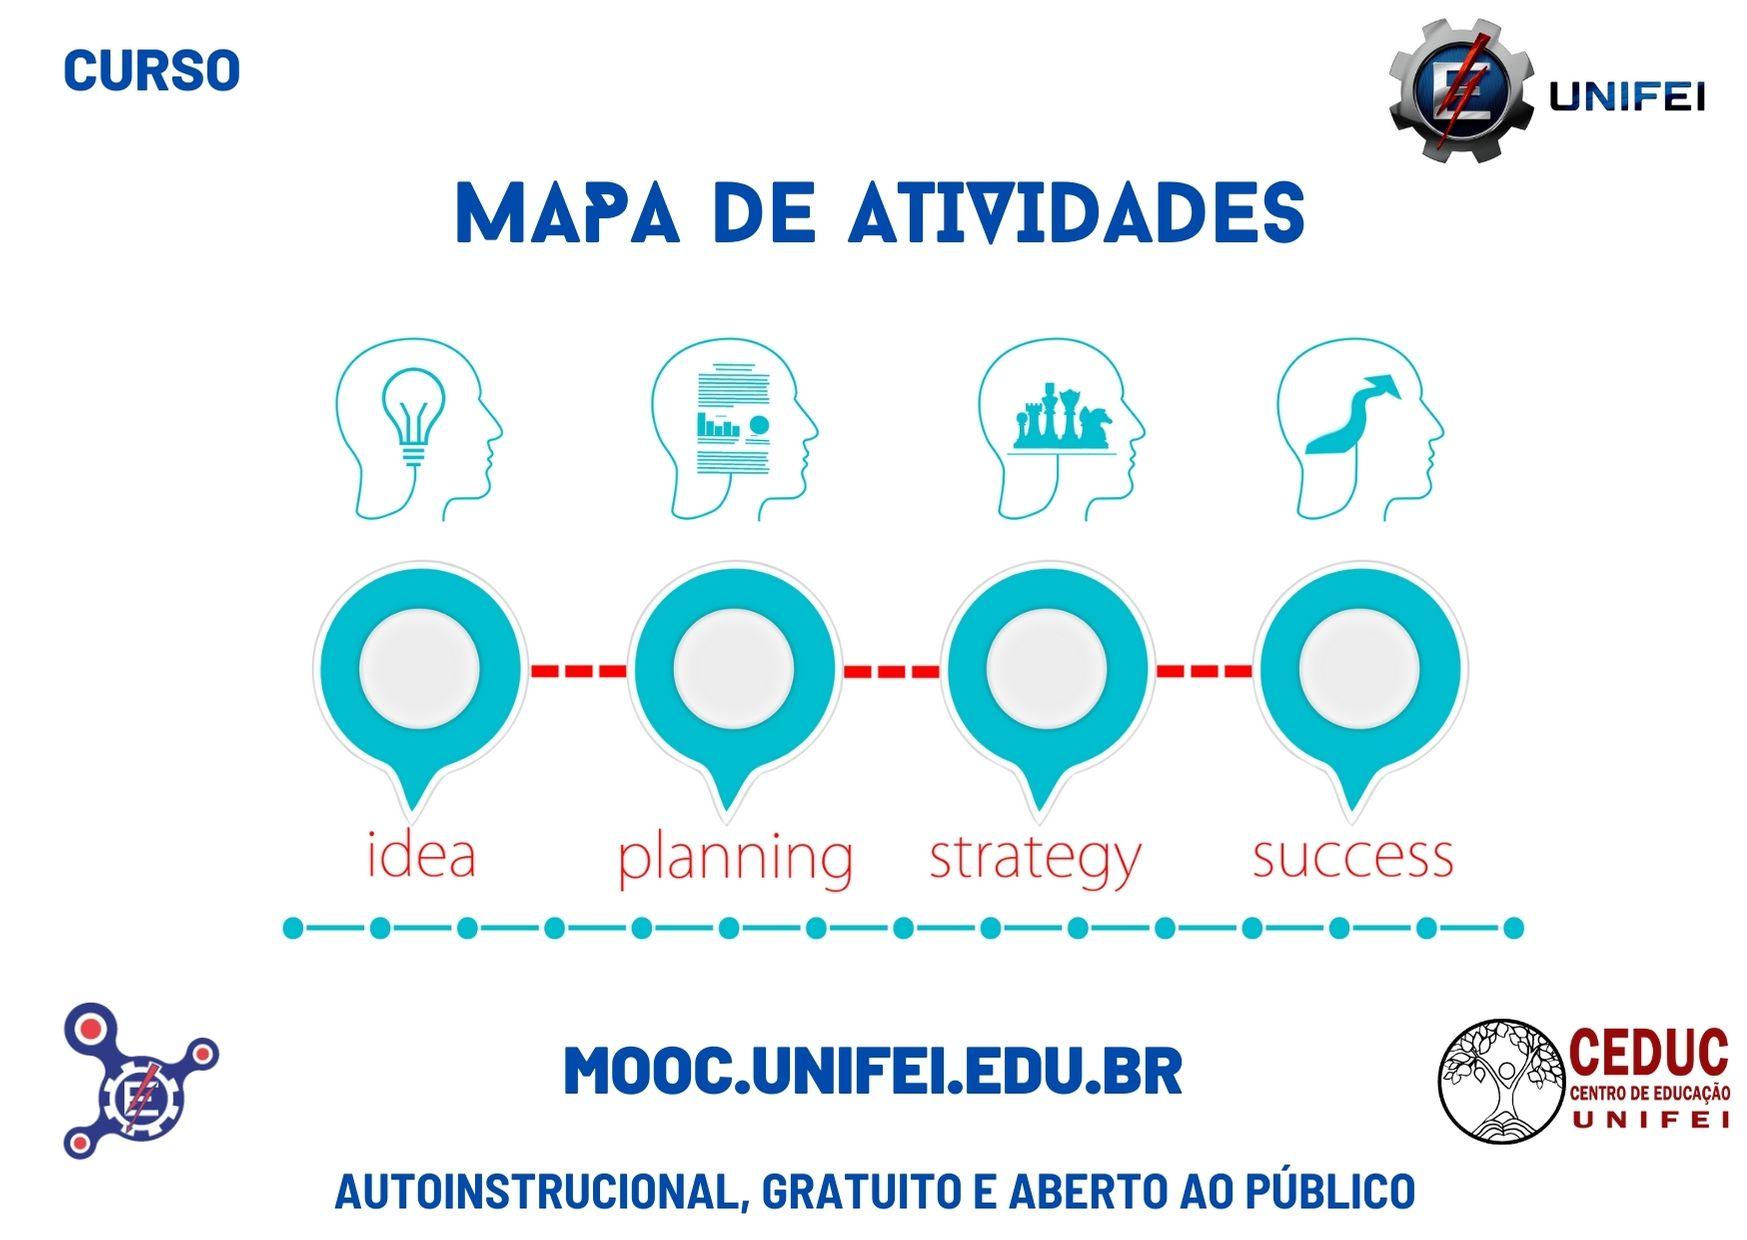 MINICURSO MAPA DE ATIVIDADES PARA PLANEJAMENTO DE CURSO EAD